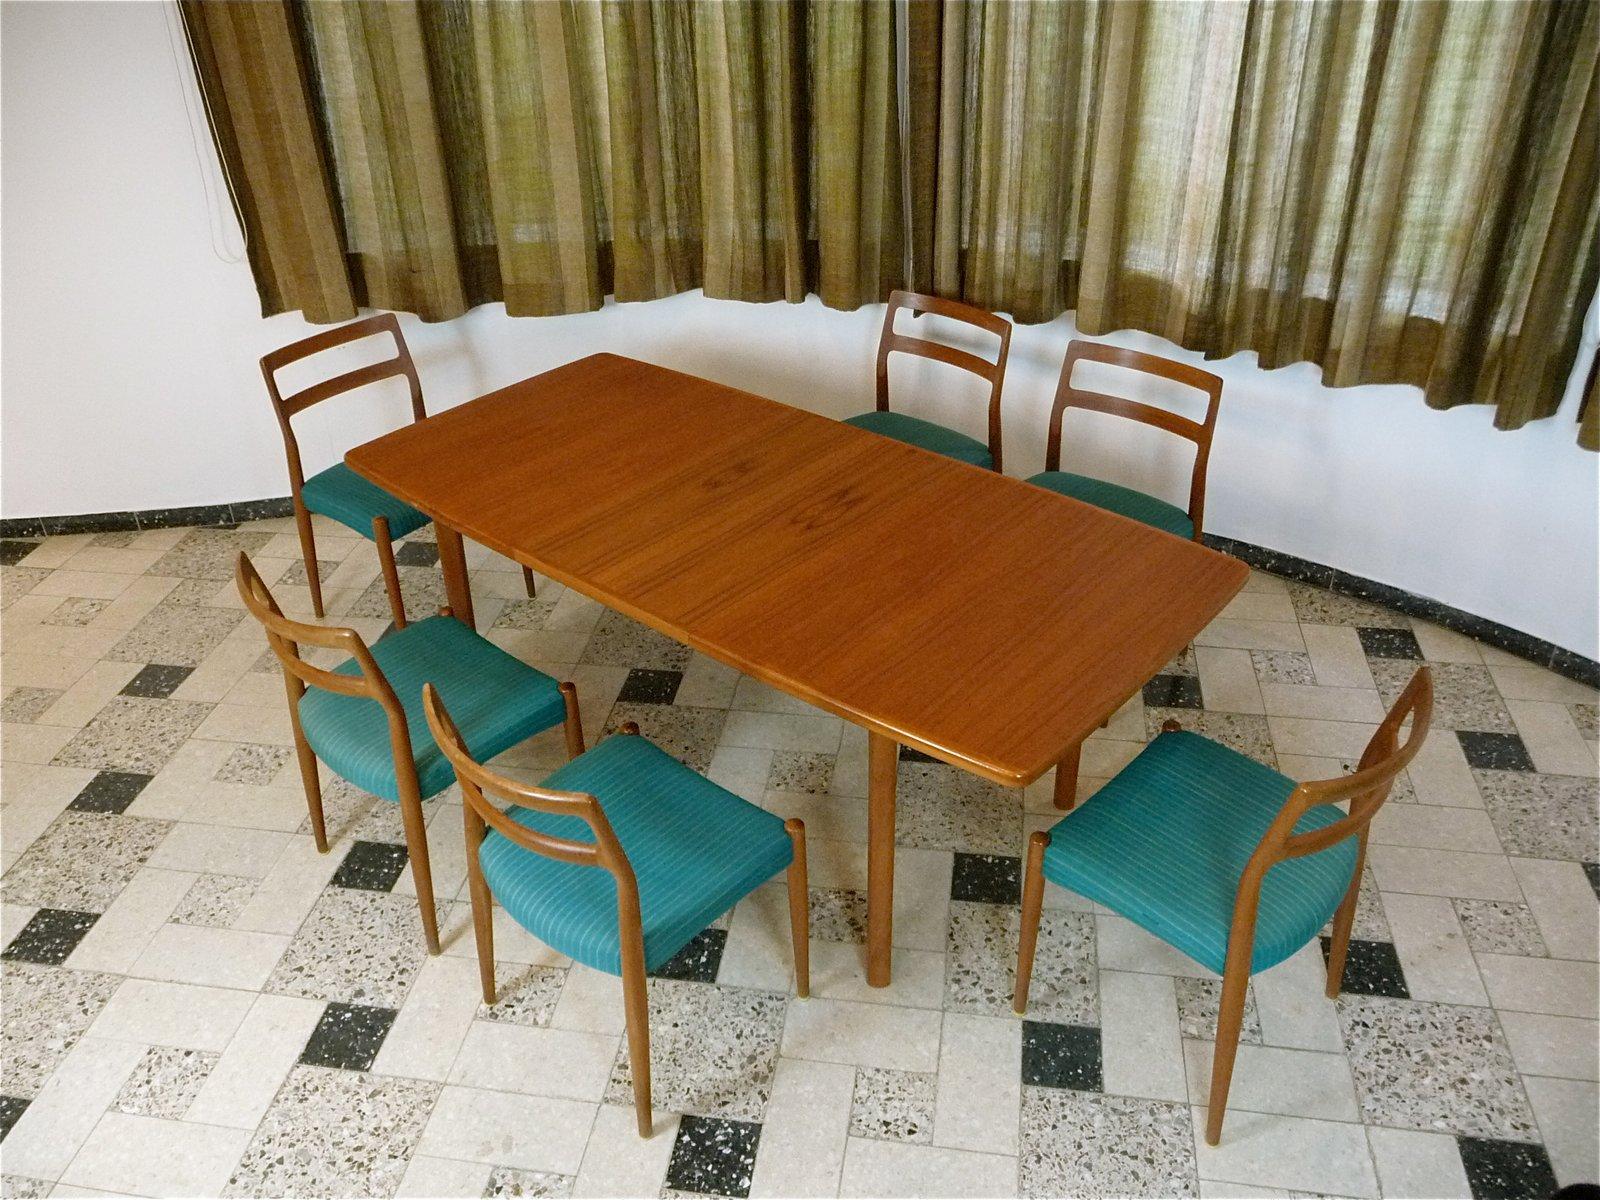 table de salle manger rallonge en teck danemark 1970s en vente sur pamono. Black Bedroom Furniture Sets. Home Design Ideas